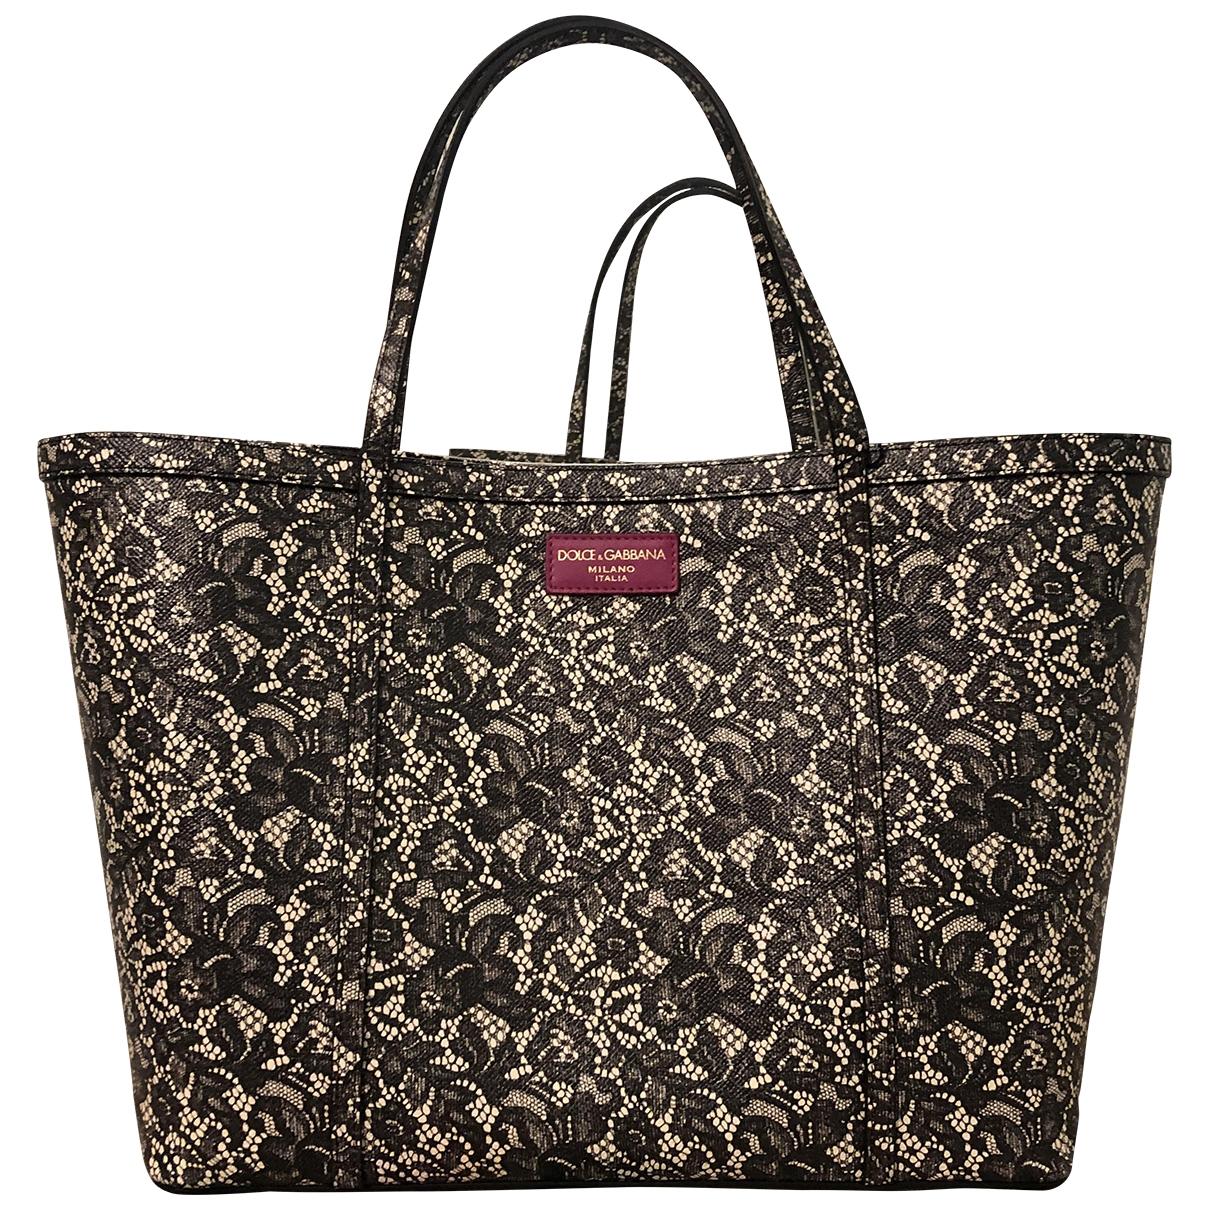 Dolce & Gabbana \N Leather handbag for Women \N